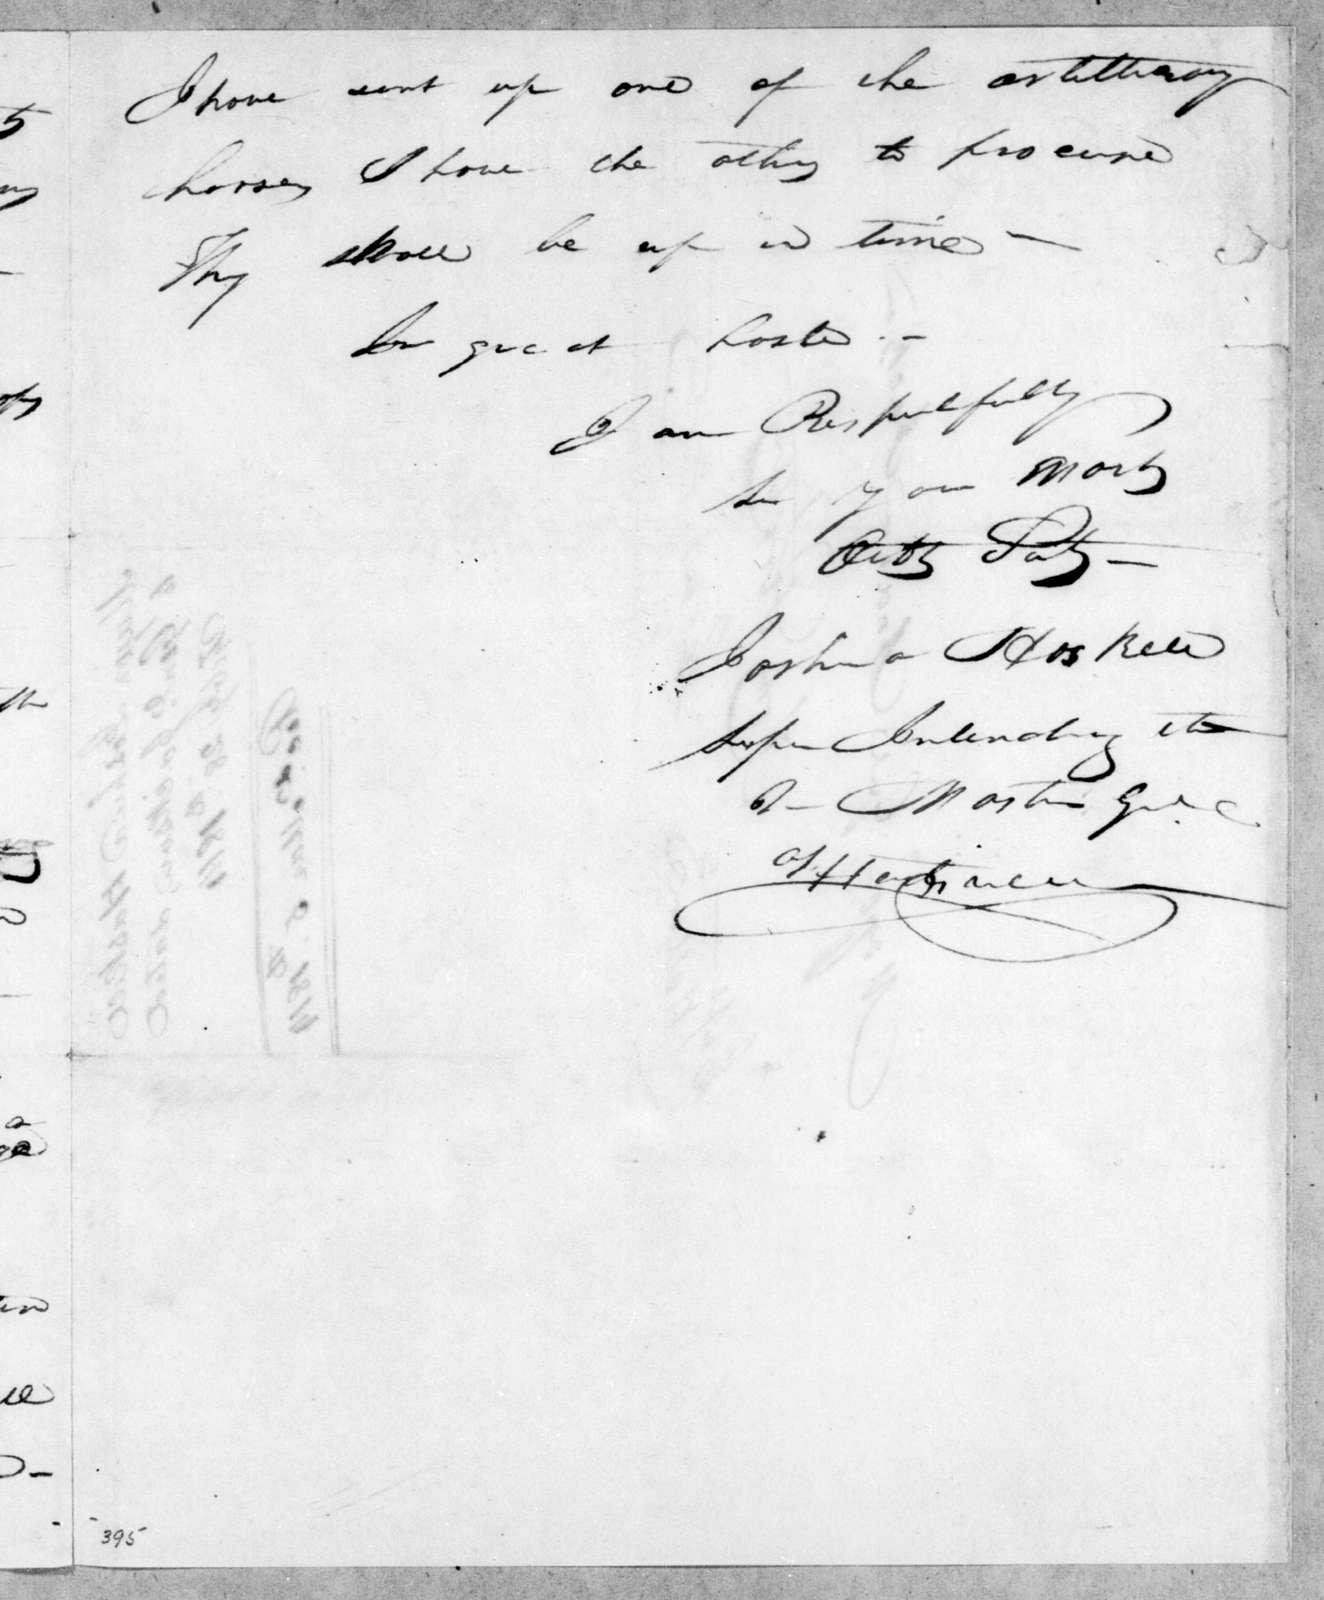 Joshua Haskell to Andrew Jackson, February 28, 1814